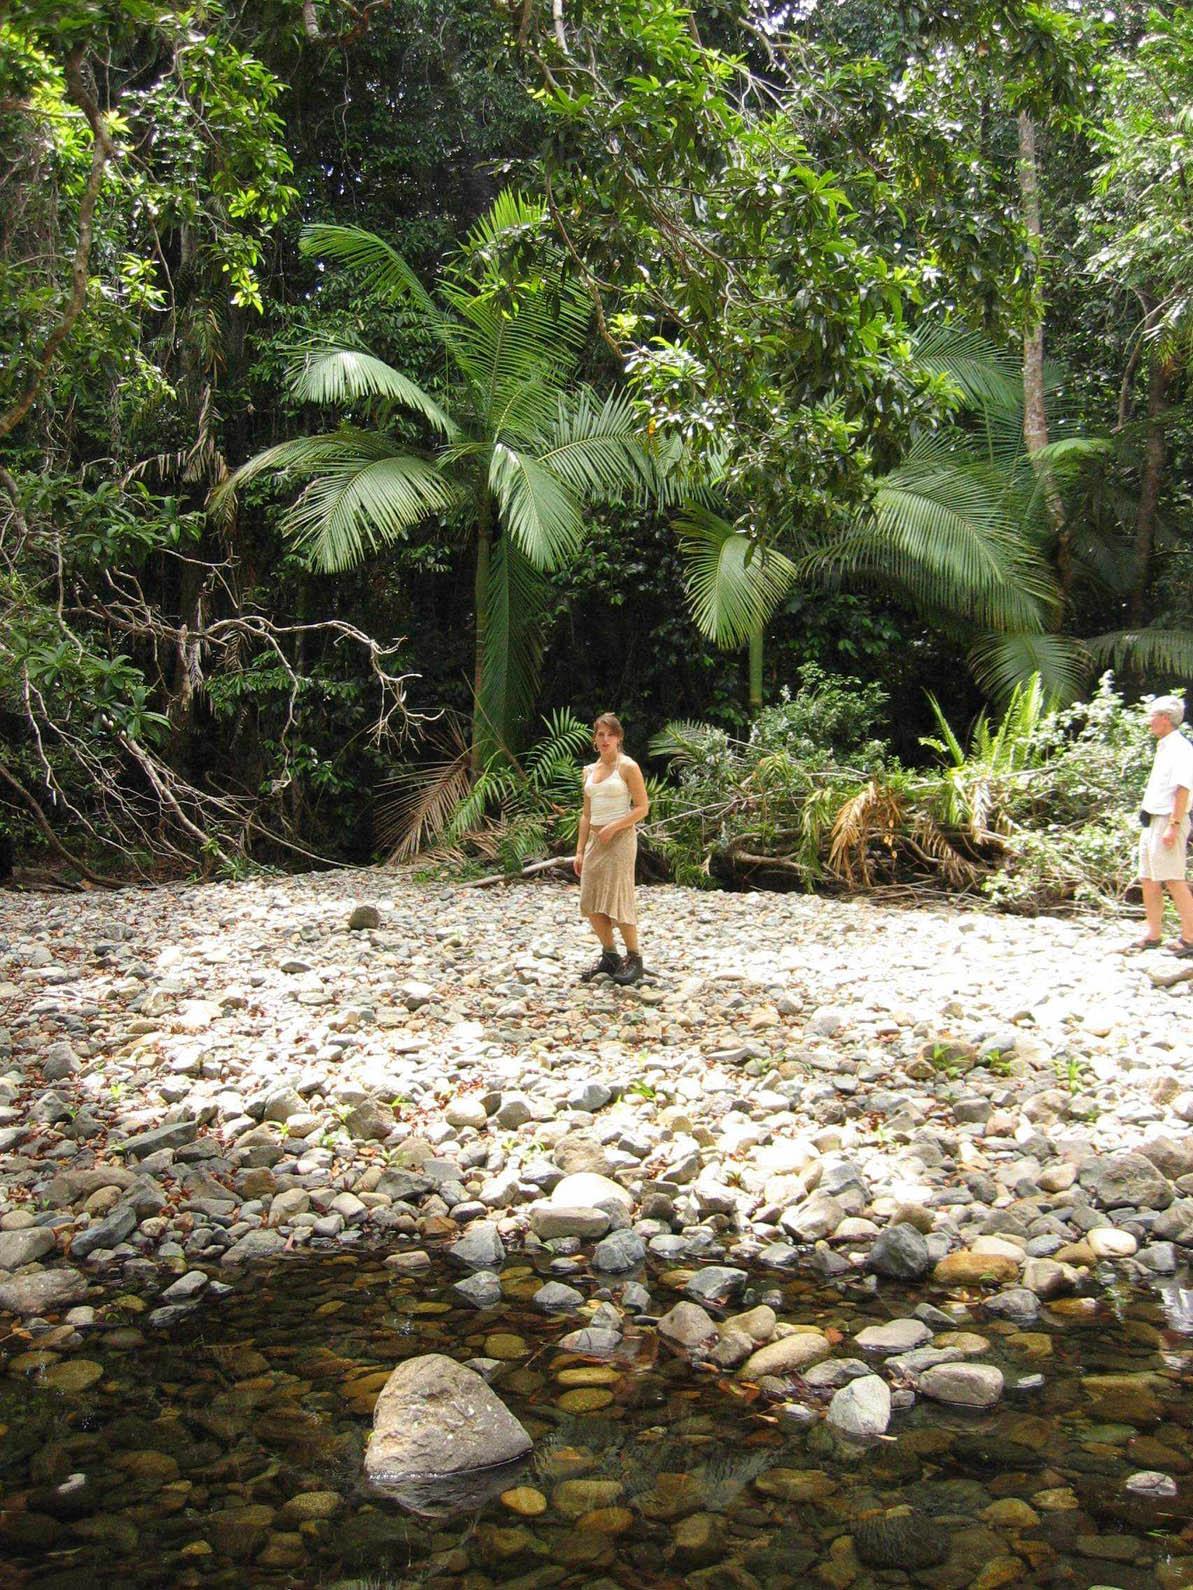 Rainforest09